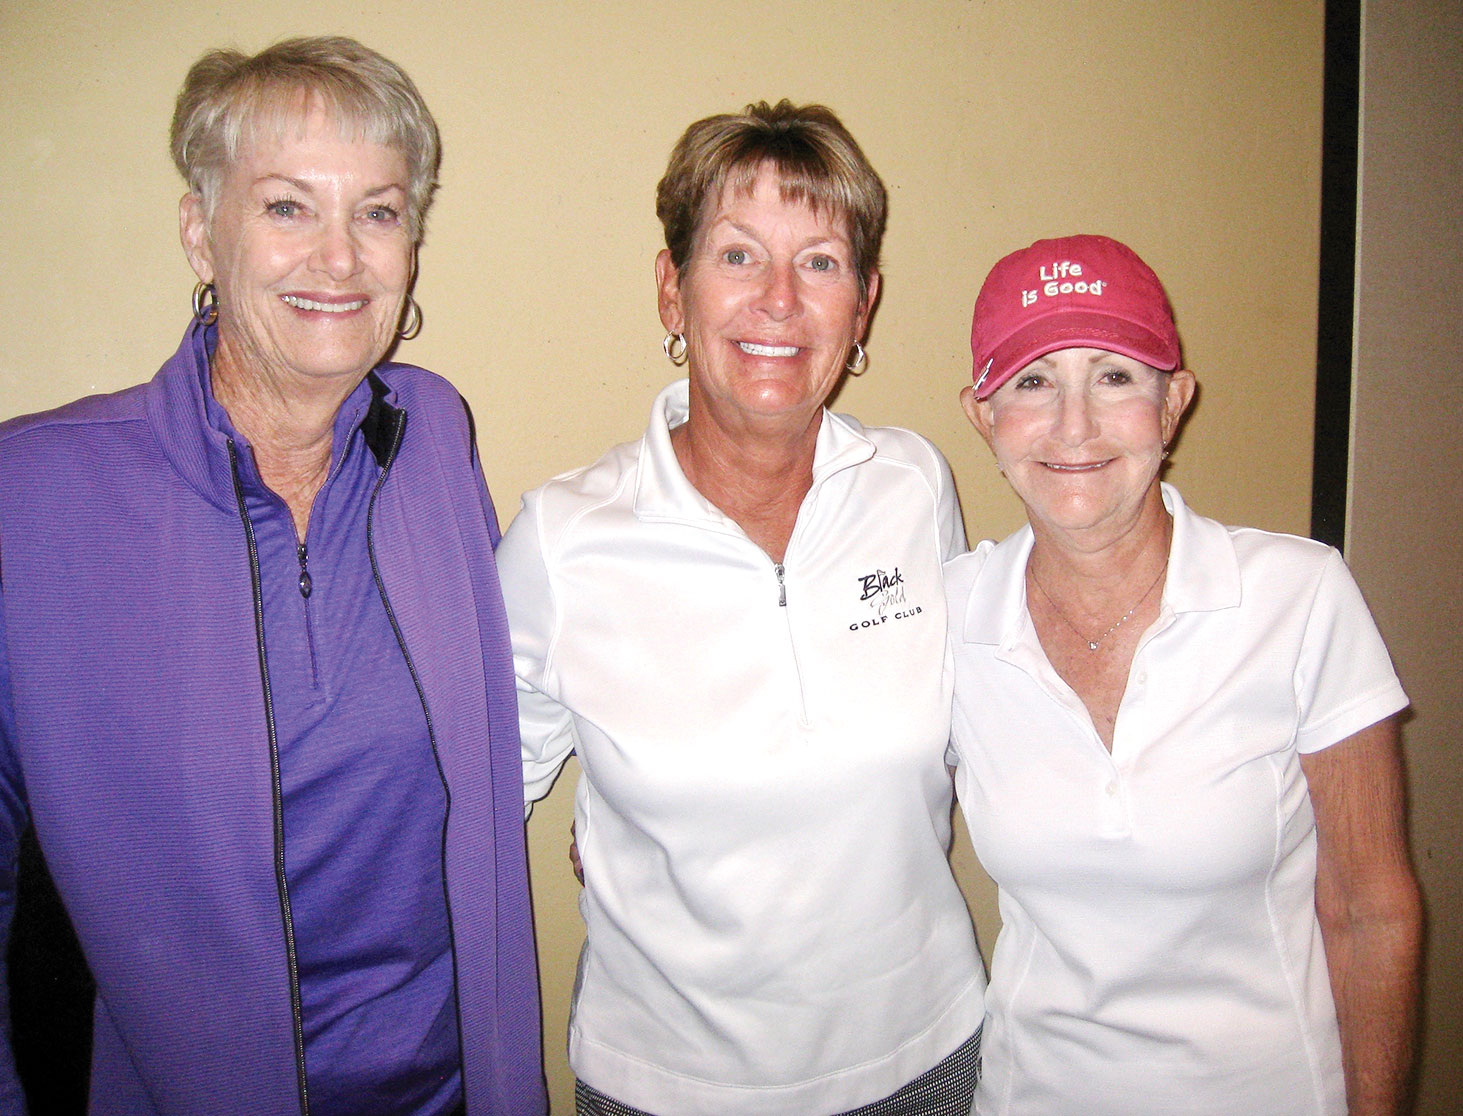 Quail Creek flight one winners Bonny Wilcox, Justine Lewis and Kathy Brennan